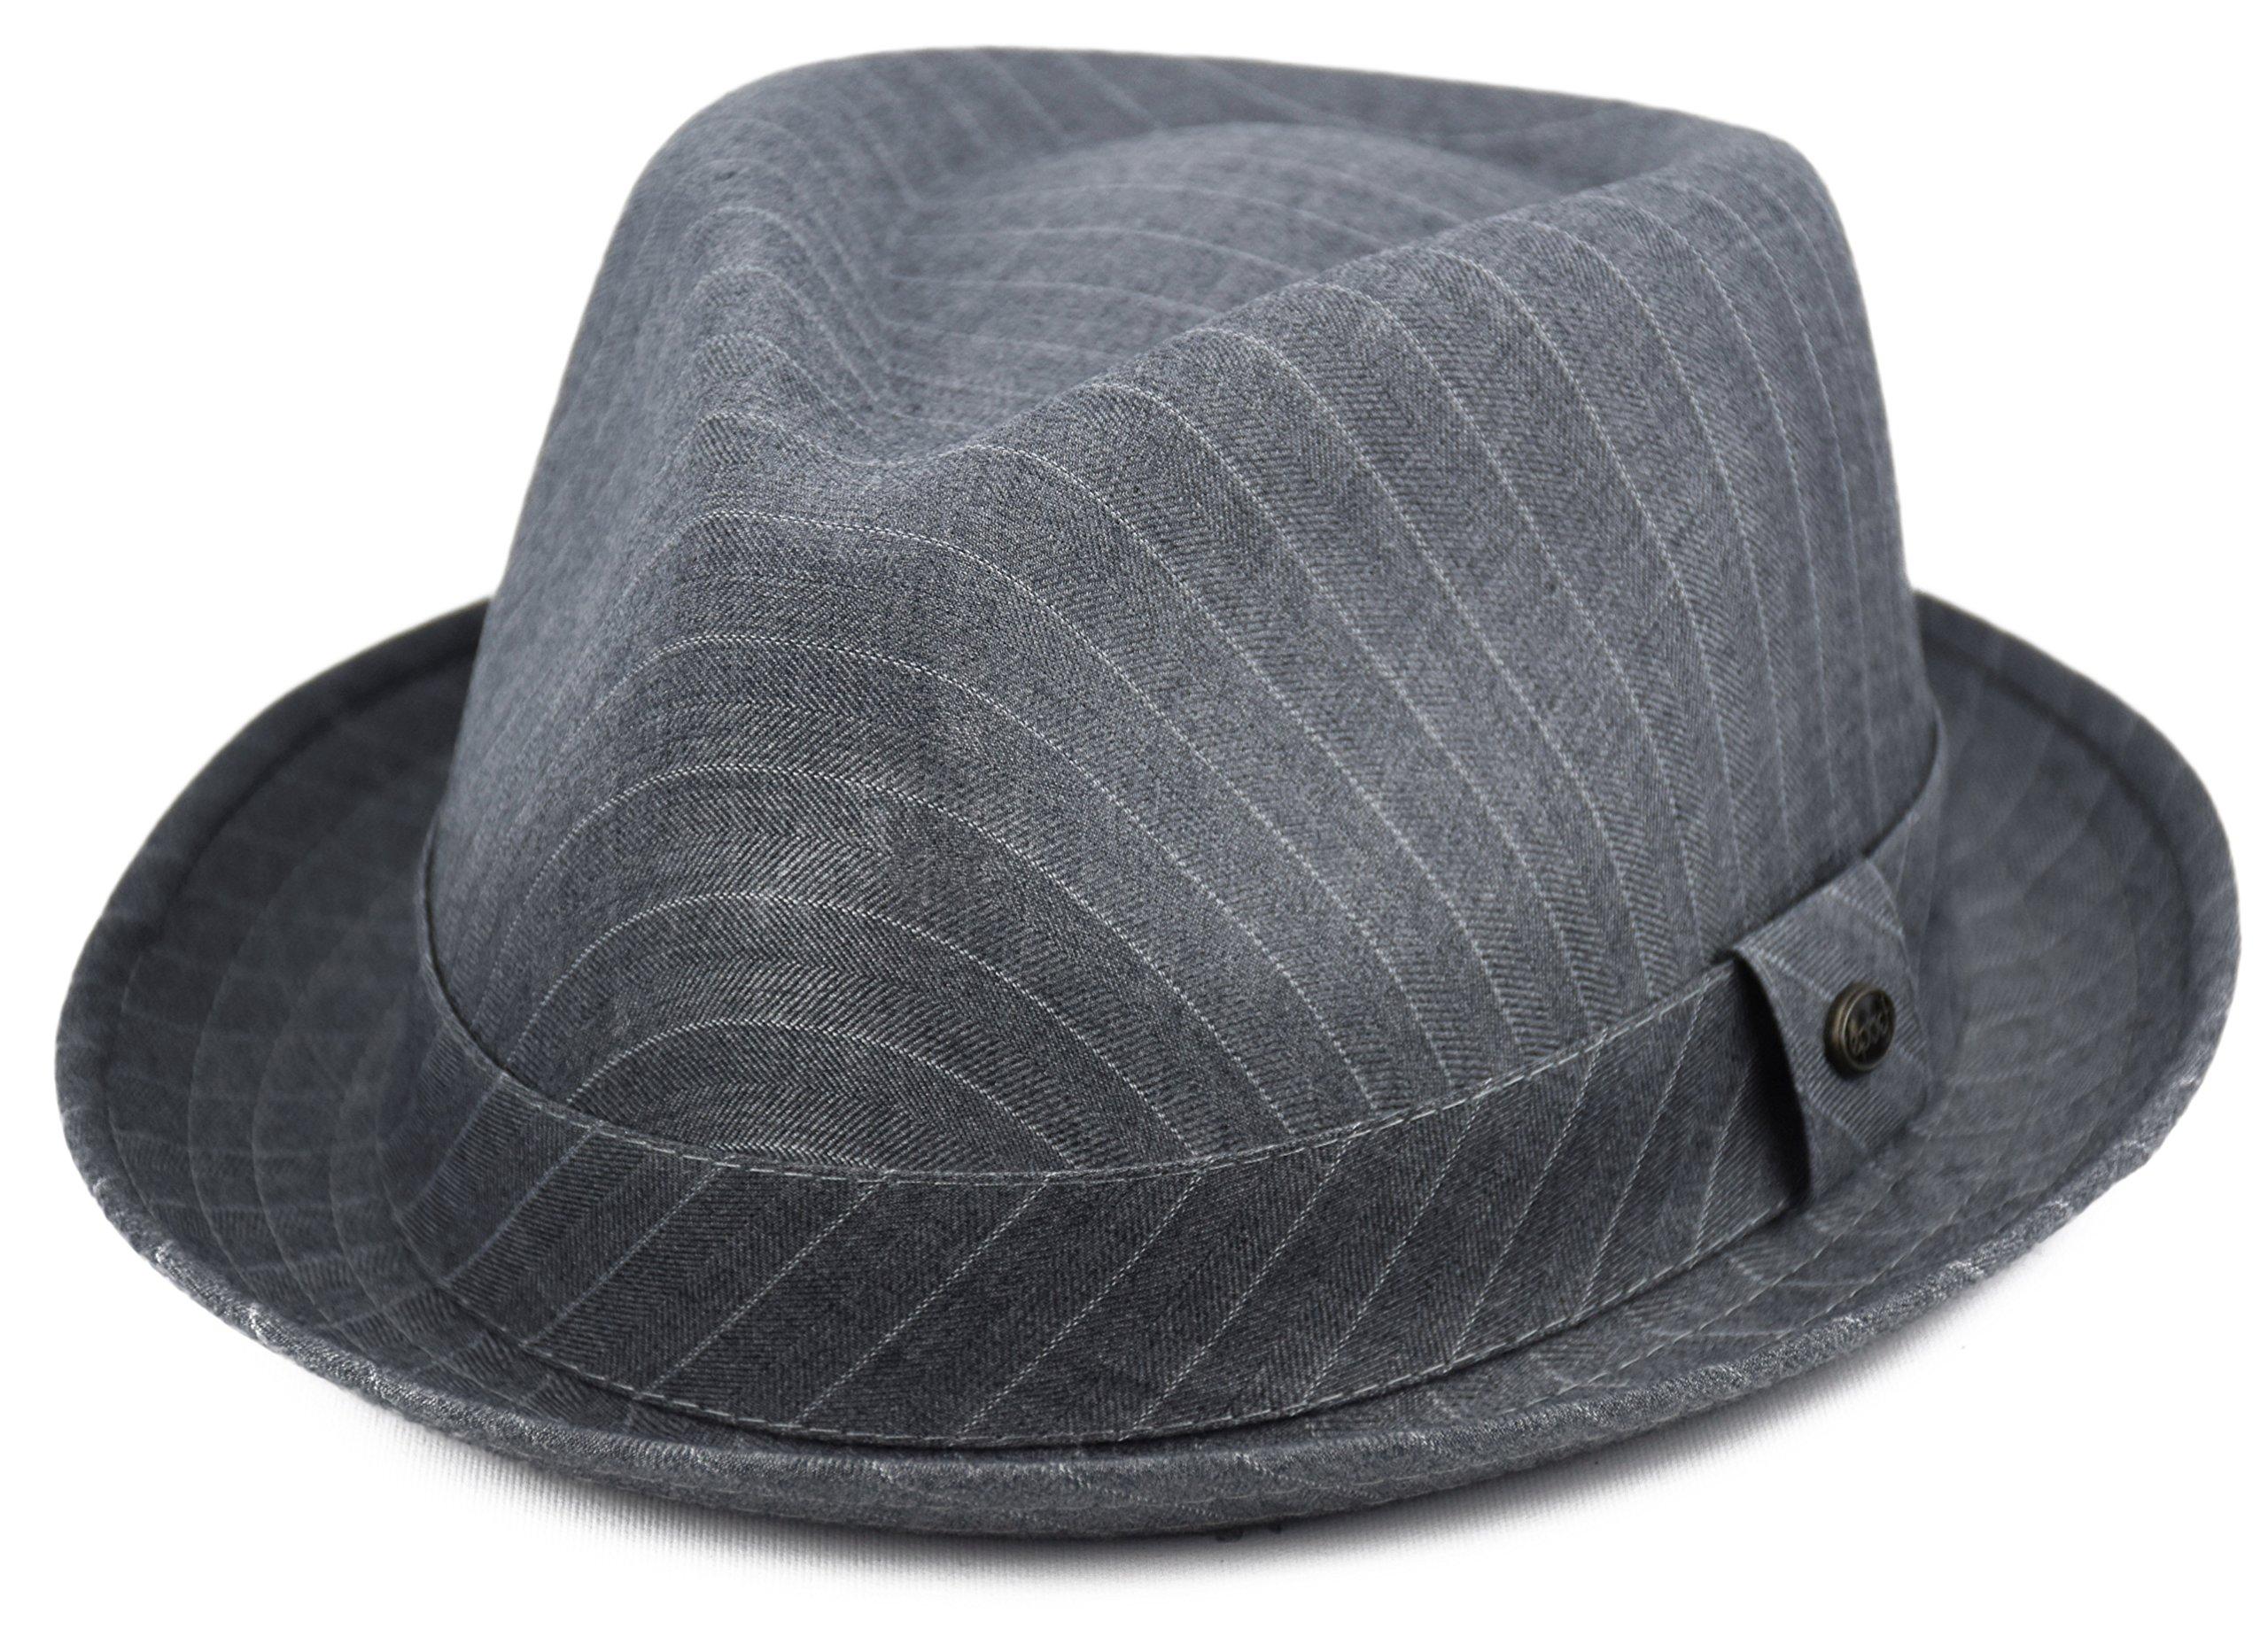 Mens Summer Fedora Hat, Porkpie Stingy Brim, Light Weight Dress Hat (Pinstripe-Gray, L/XL)